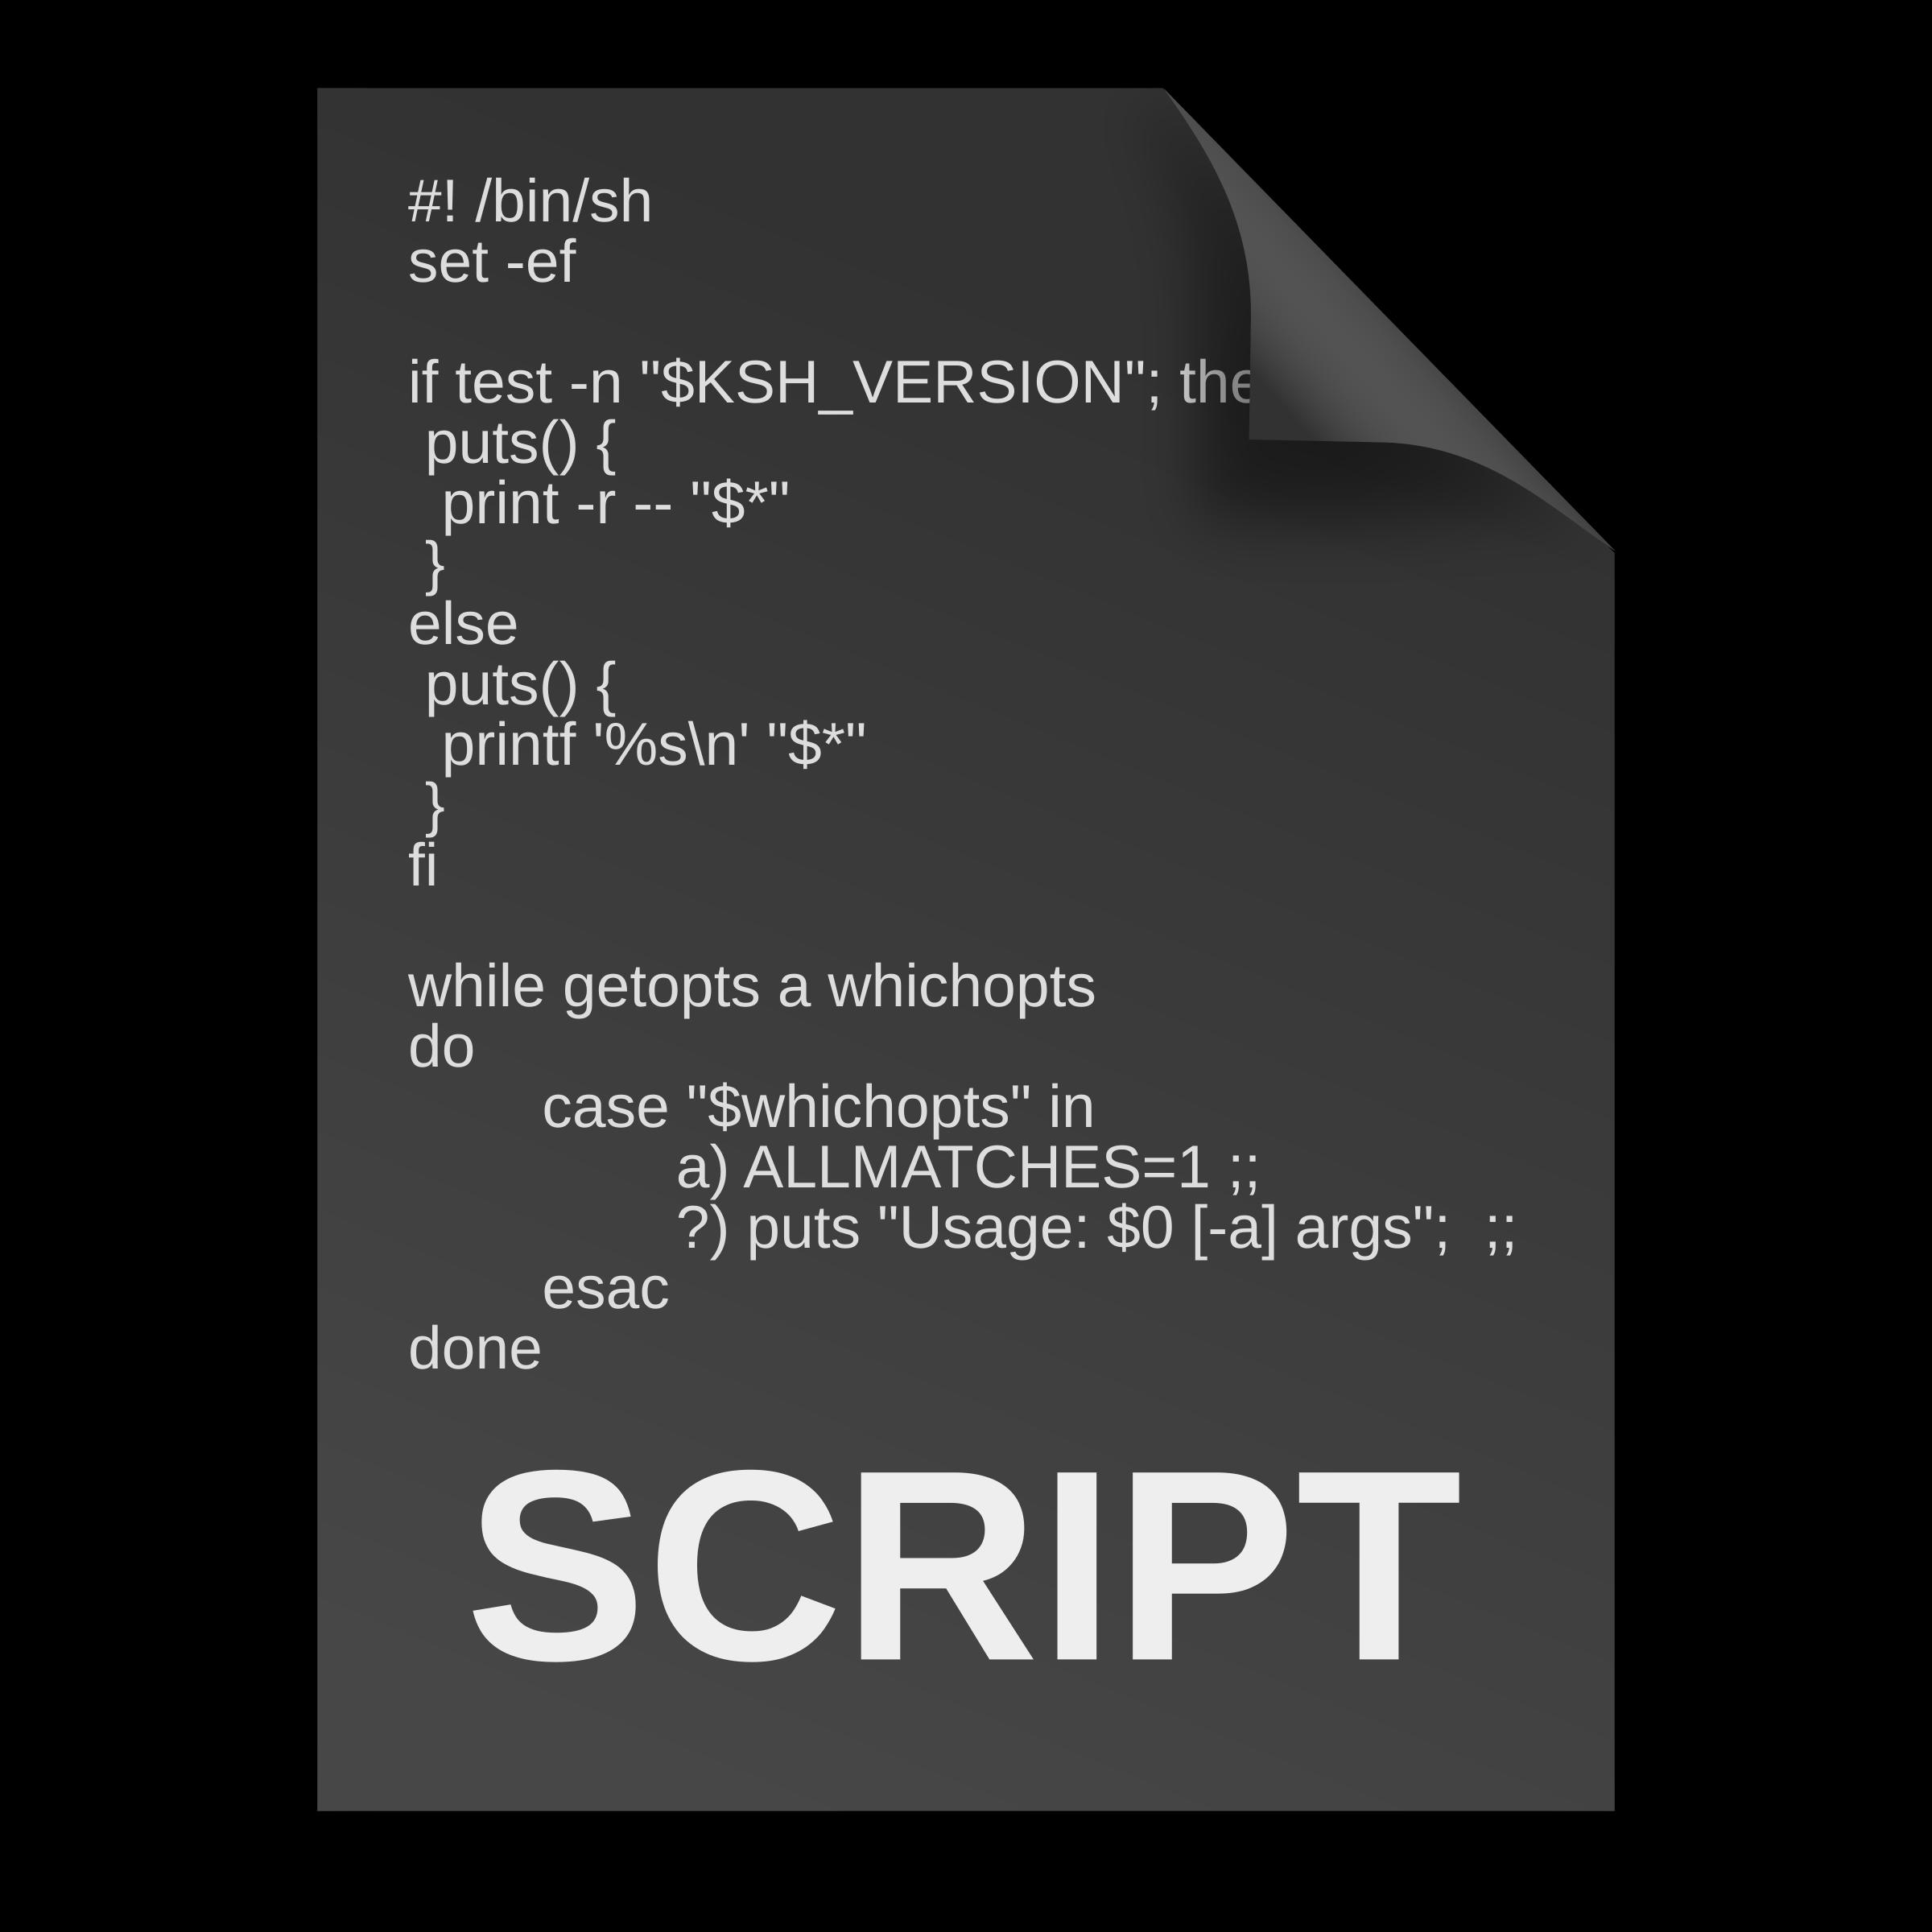 Outline clipart bin. Script document icon outlines